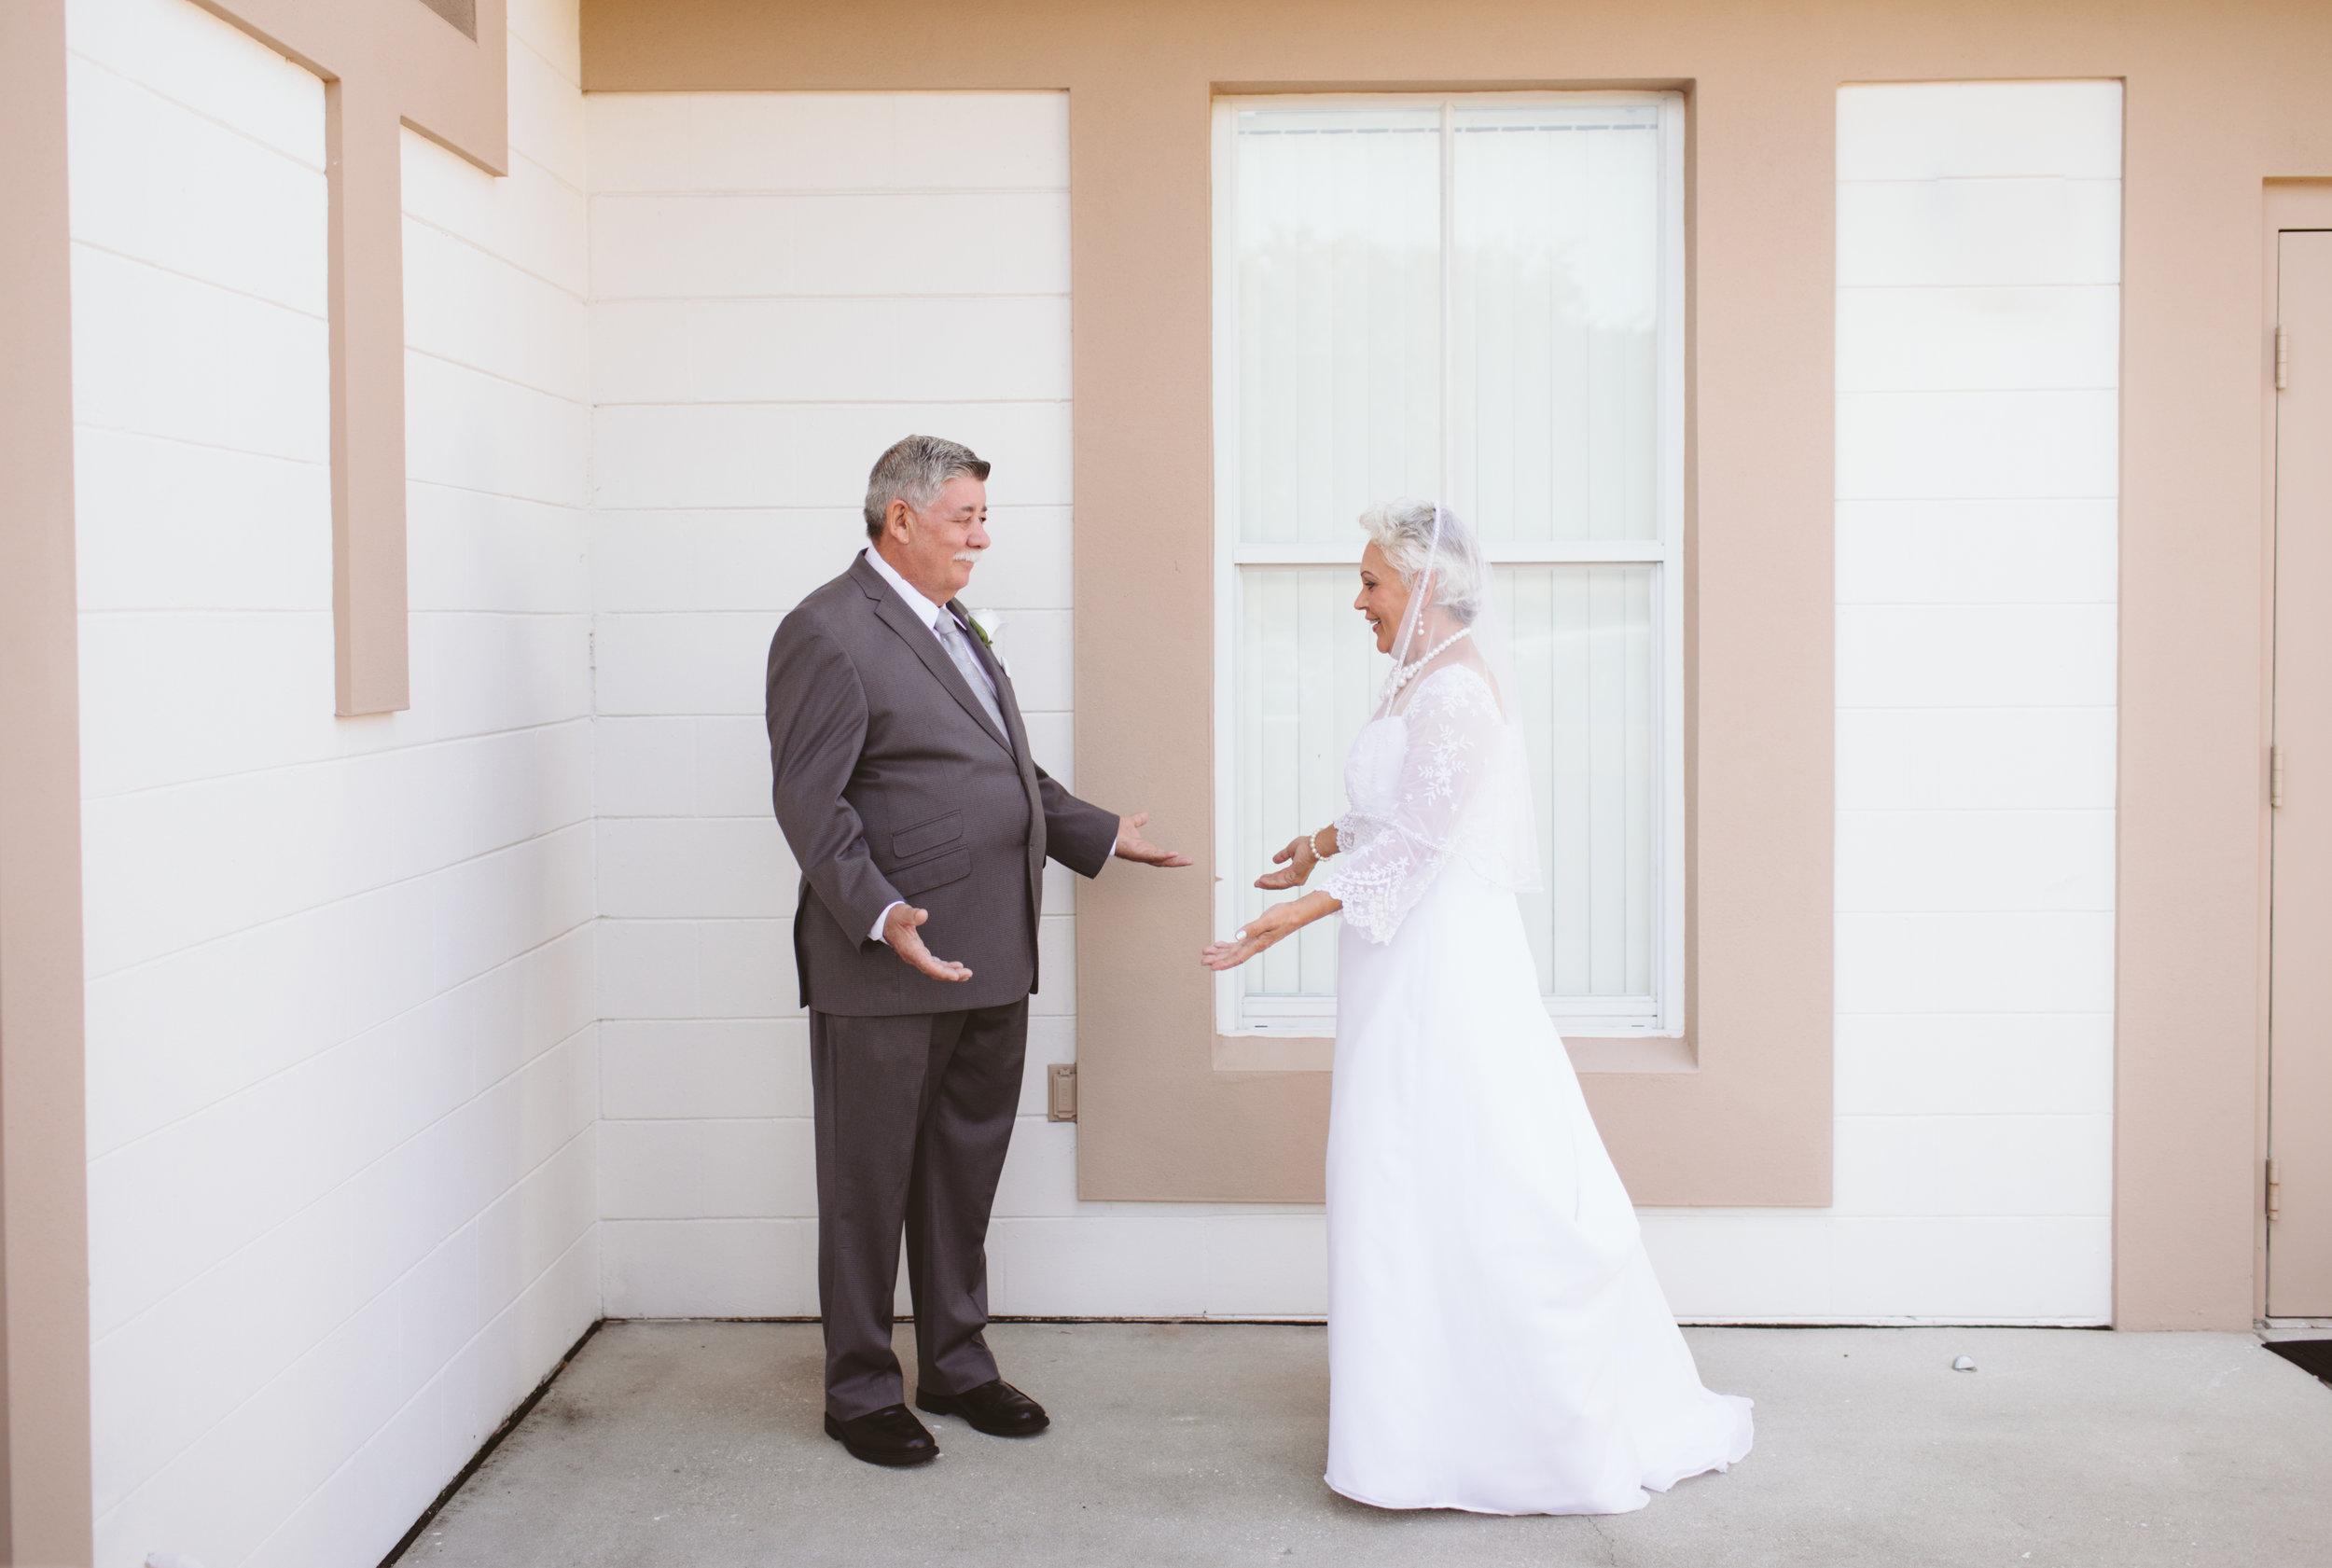 wedding | Vanessa Boy Photography | vanessaboy.com |-53.jpg